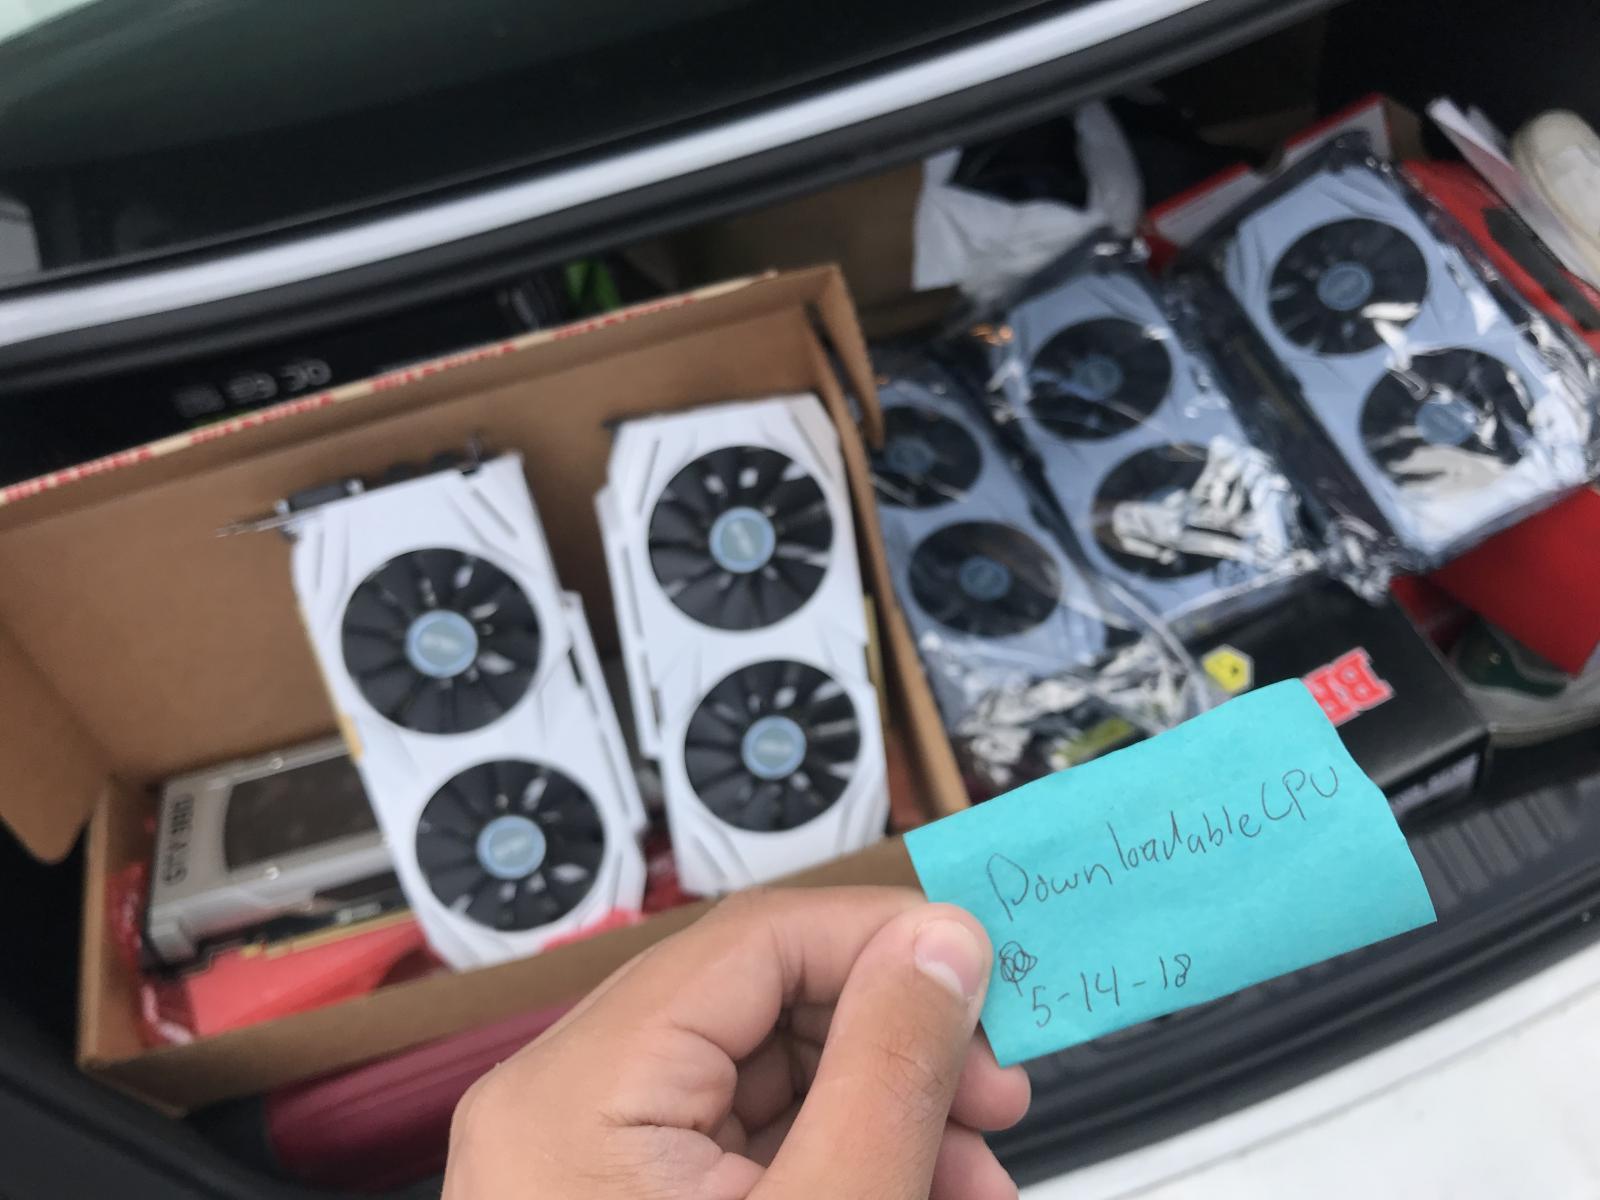 Photo of [USA-MN][H] 5 ASUS GTX 1060 6GB Dual , GTX 980 FE